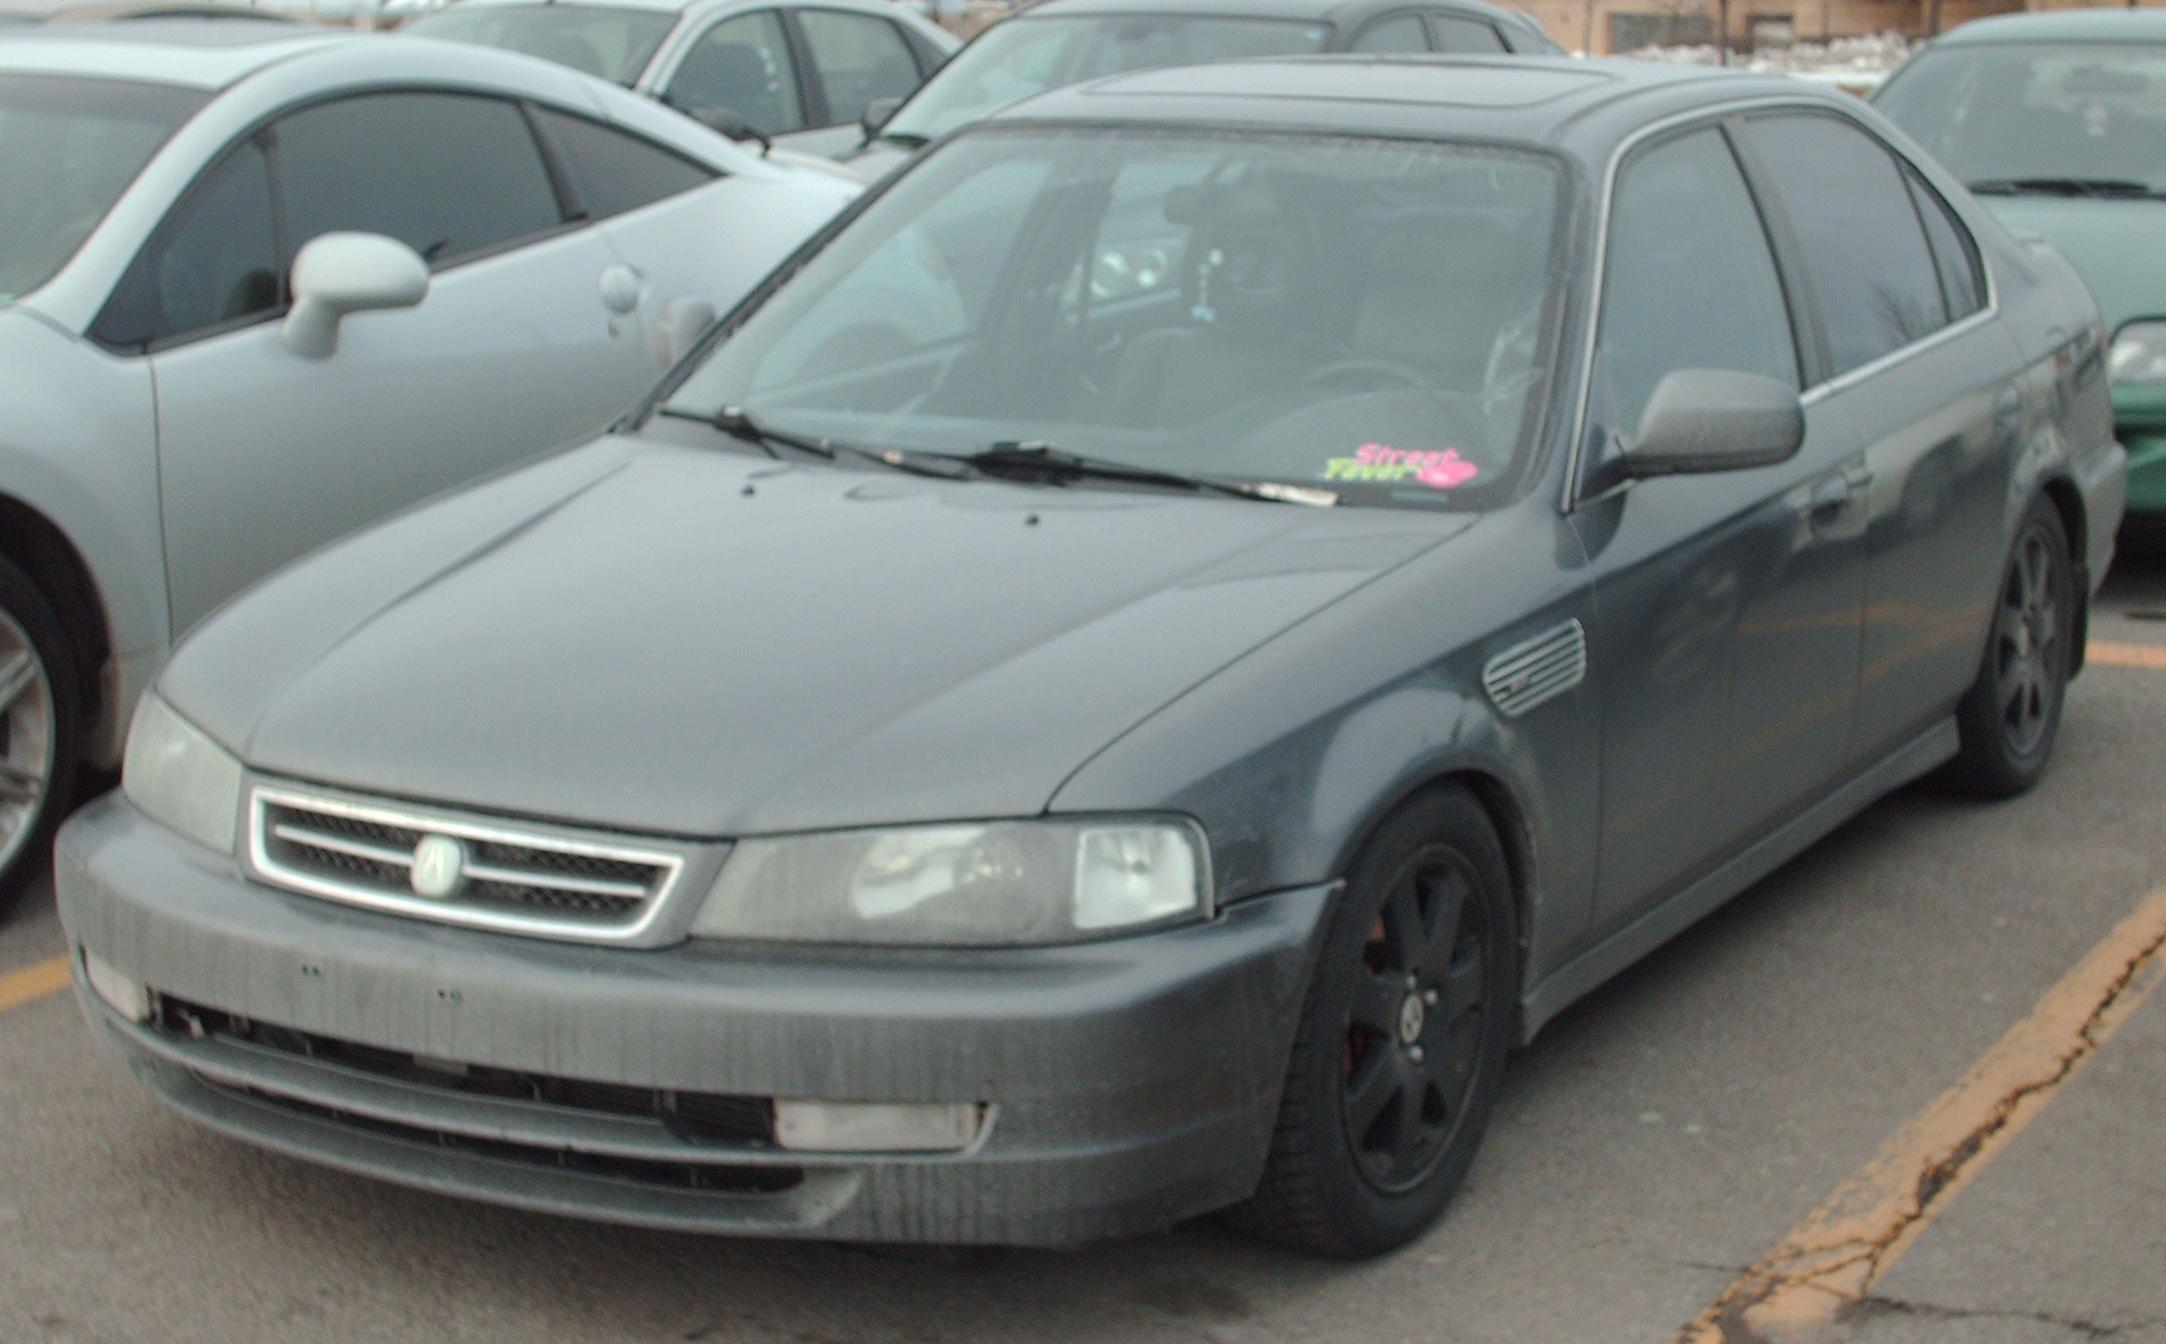 File:Tuned Acura 1.6EL.jpg - Wikimedia Commons